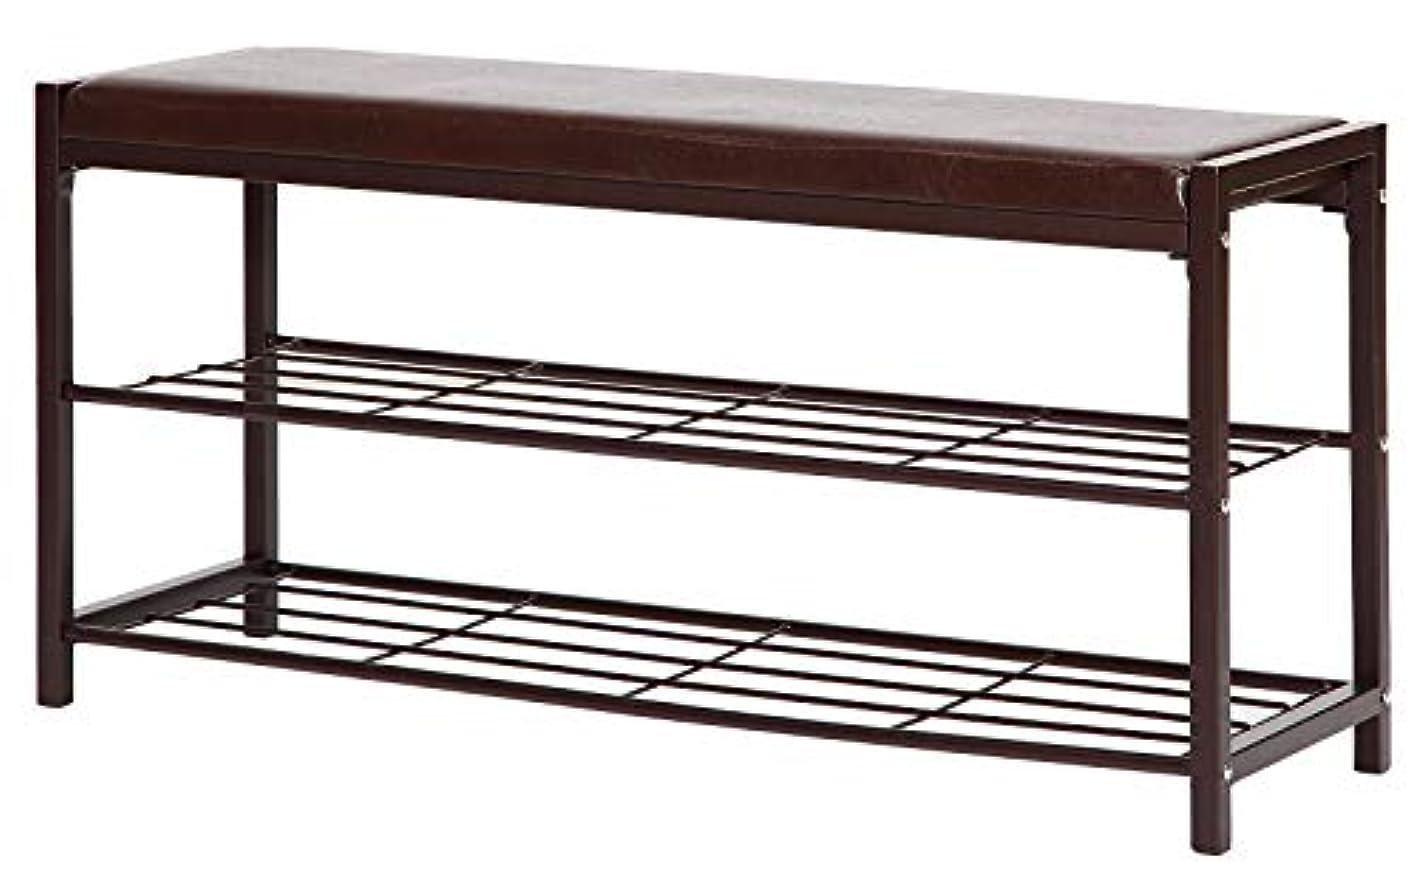 STORAGE MANIAC 2-Tier Shoe Rack Bench with Faux Leather Seat, Entryway Shoe Storage, Hallway Bench